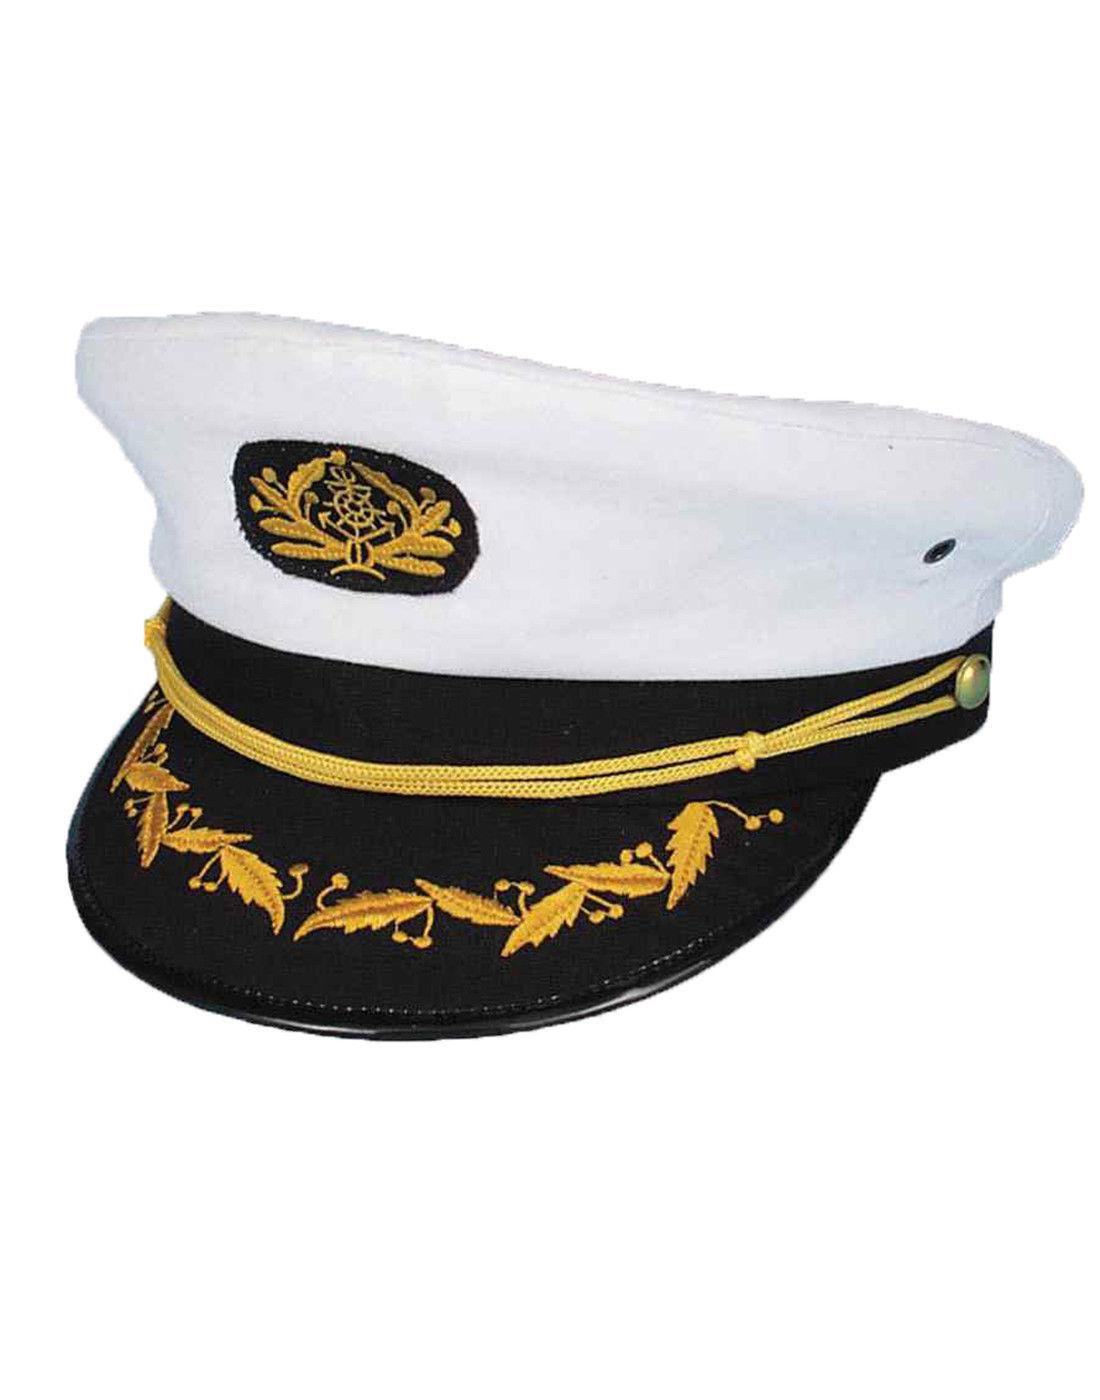 0b8ee815b1fa7 $7.74 - Adult White Captains Hat Yacht Captain Male Female Sailors Costume  Hat #ebay #Fashion